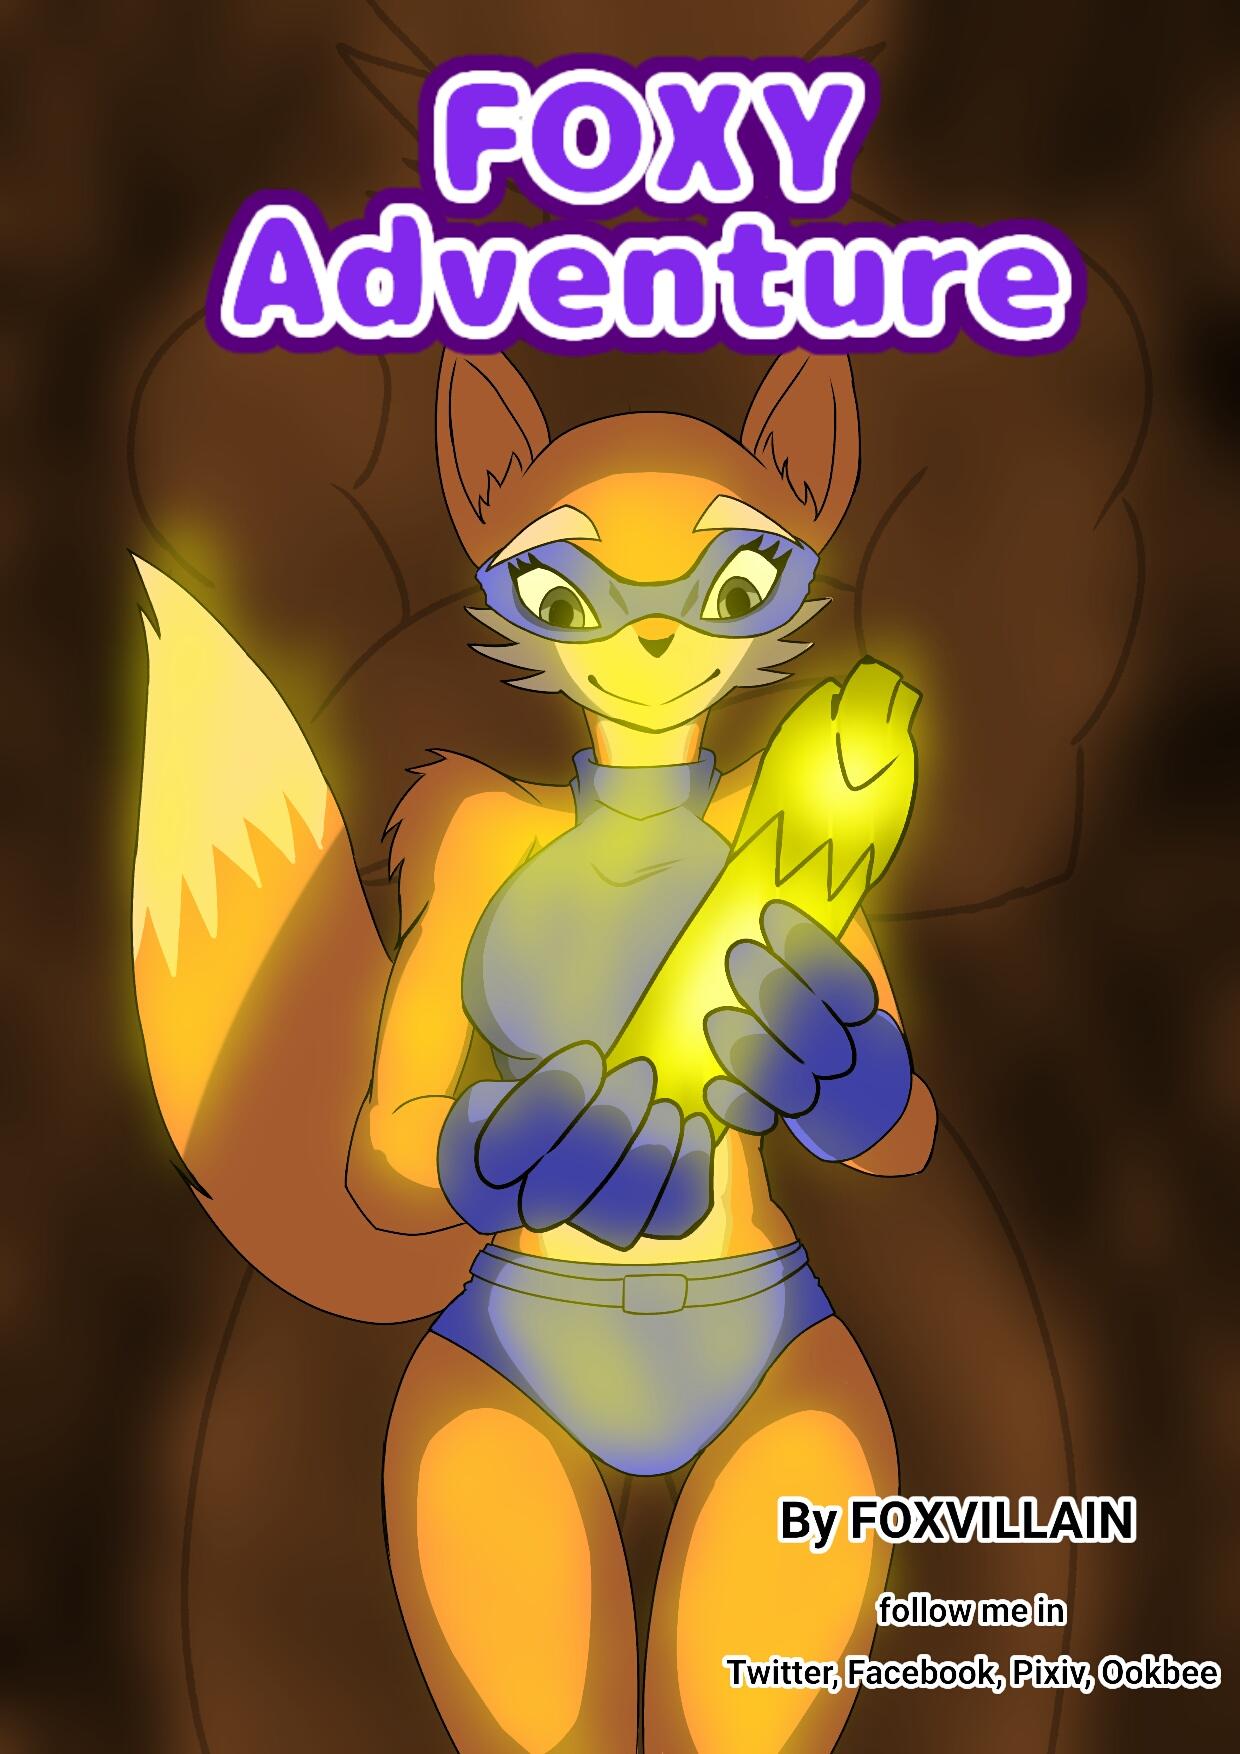 Foxy Adventure